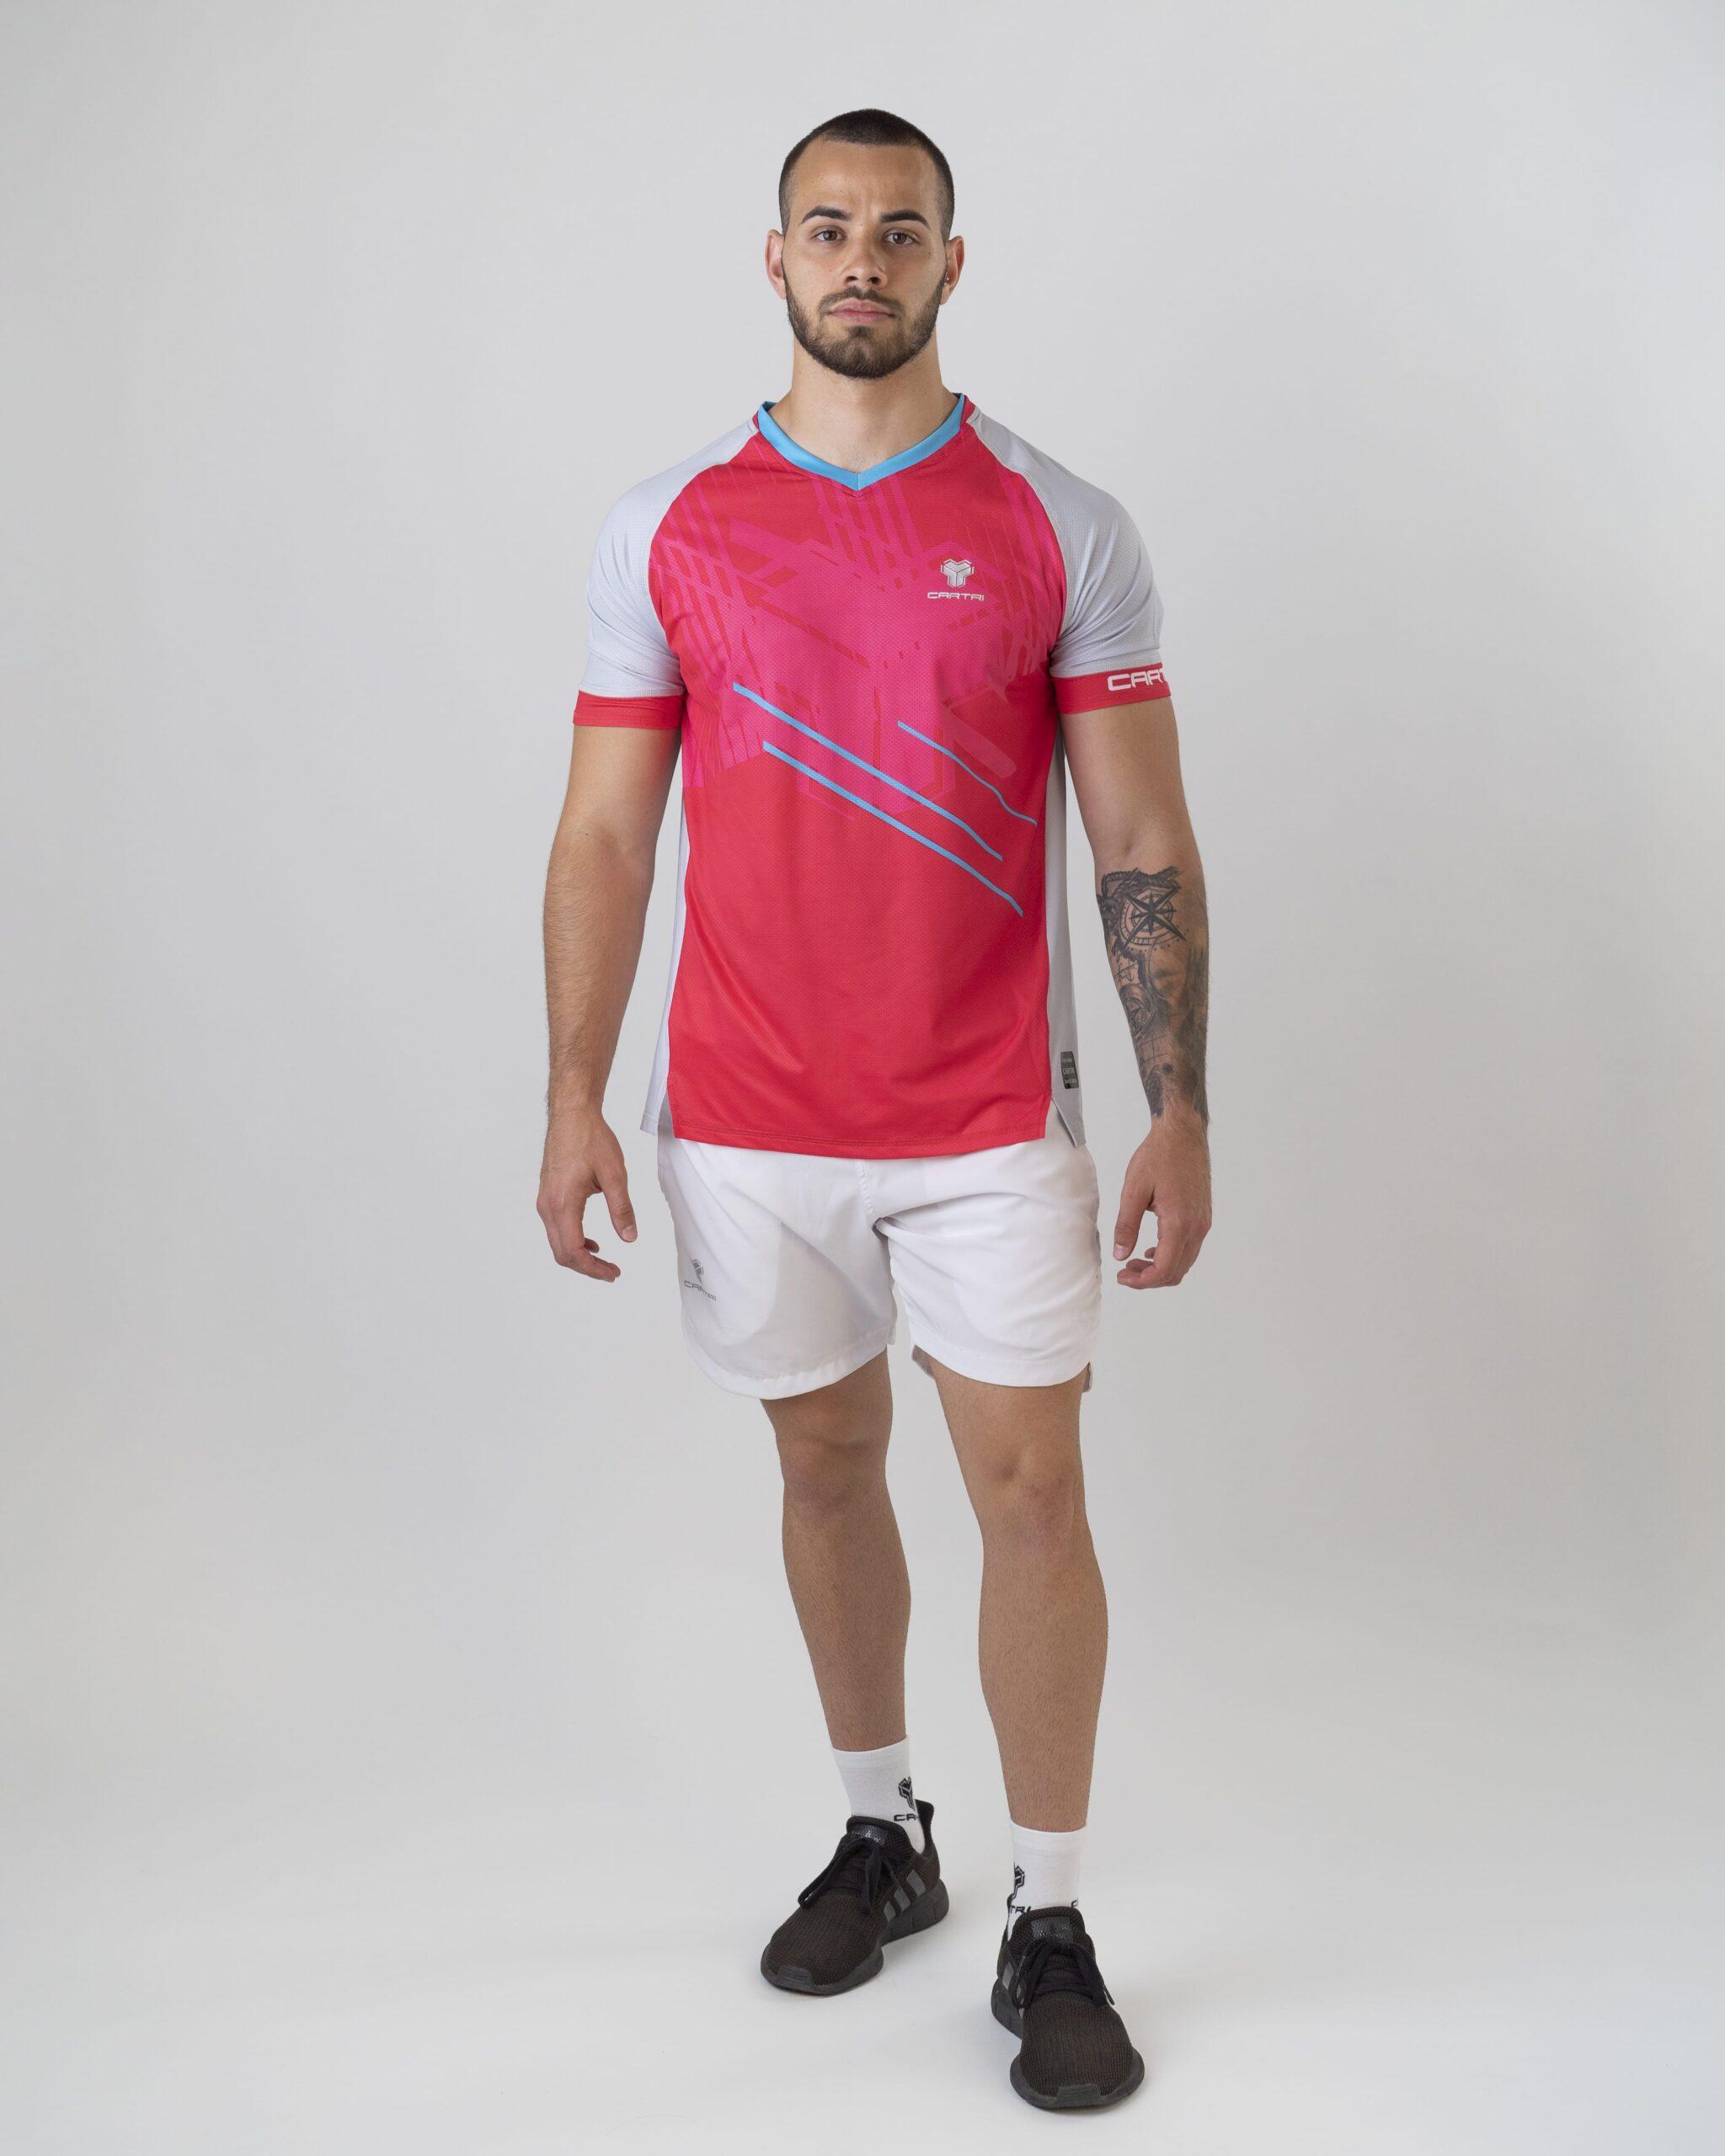 Cartri t shirt Barcelona Firebird 2021